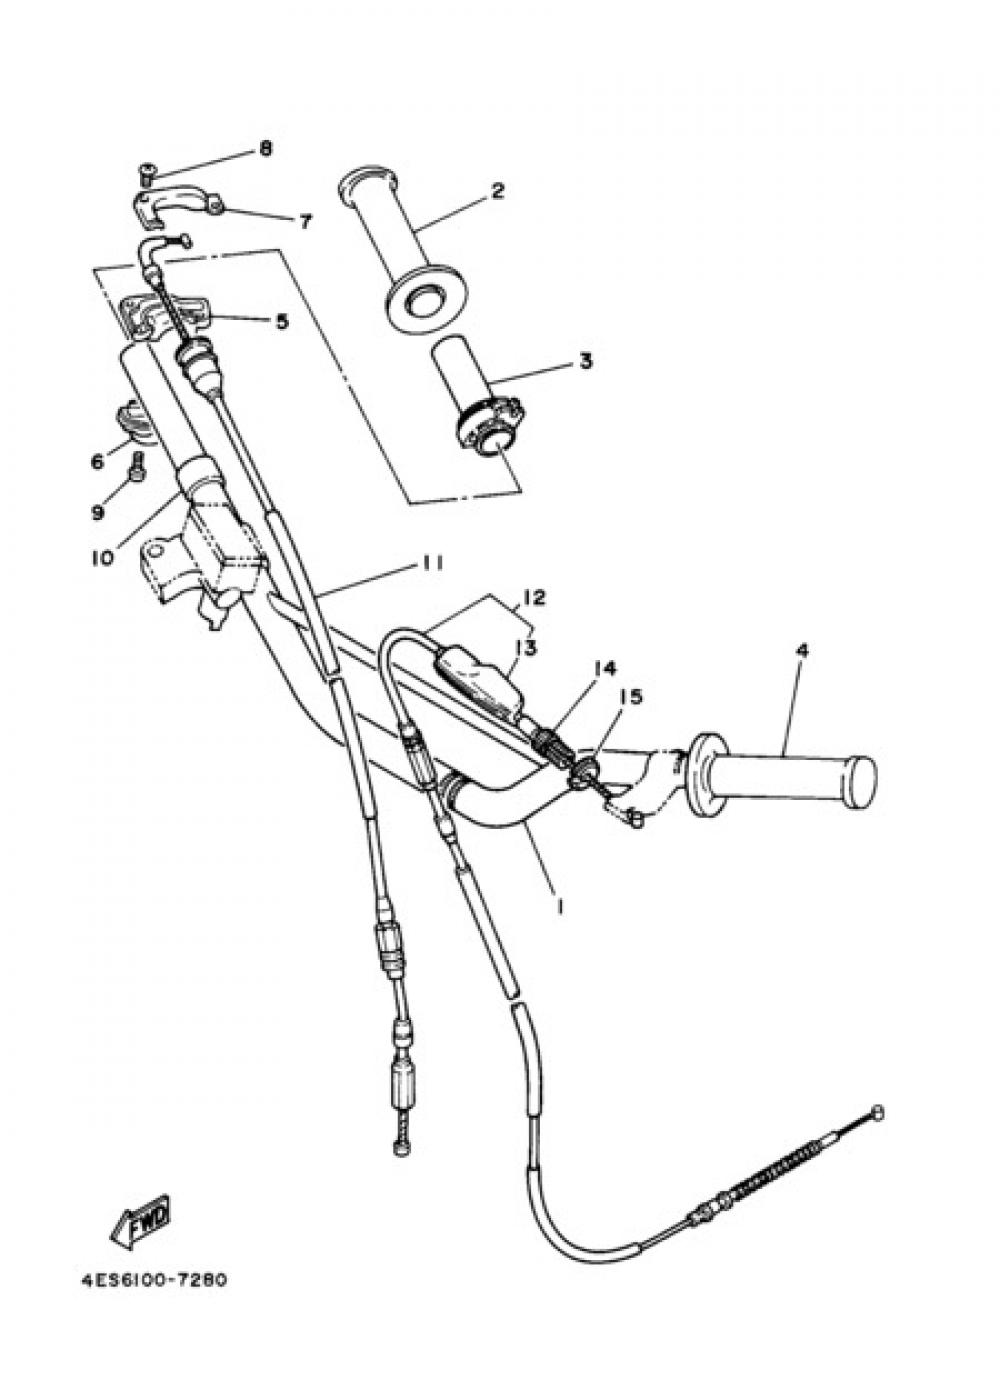 STEERING HANDLE & CABLE Yamaha YZ85 2006